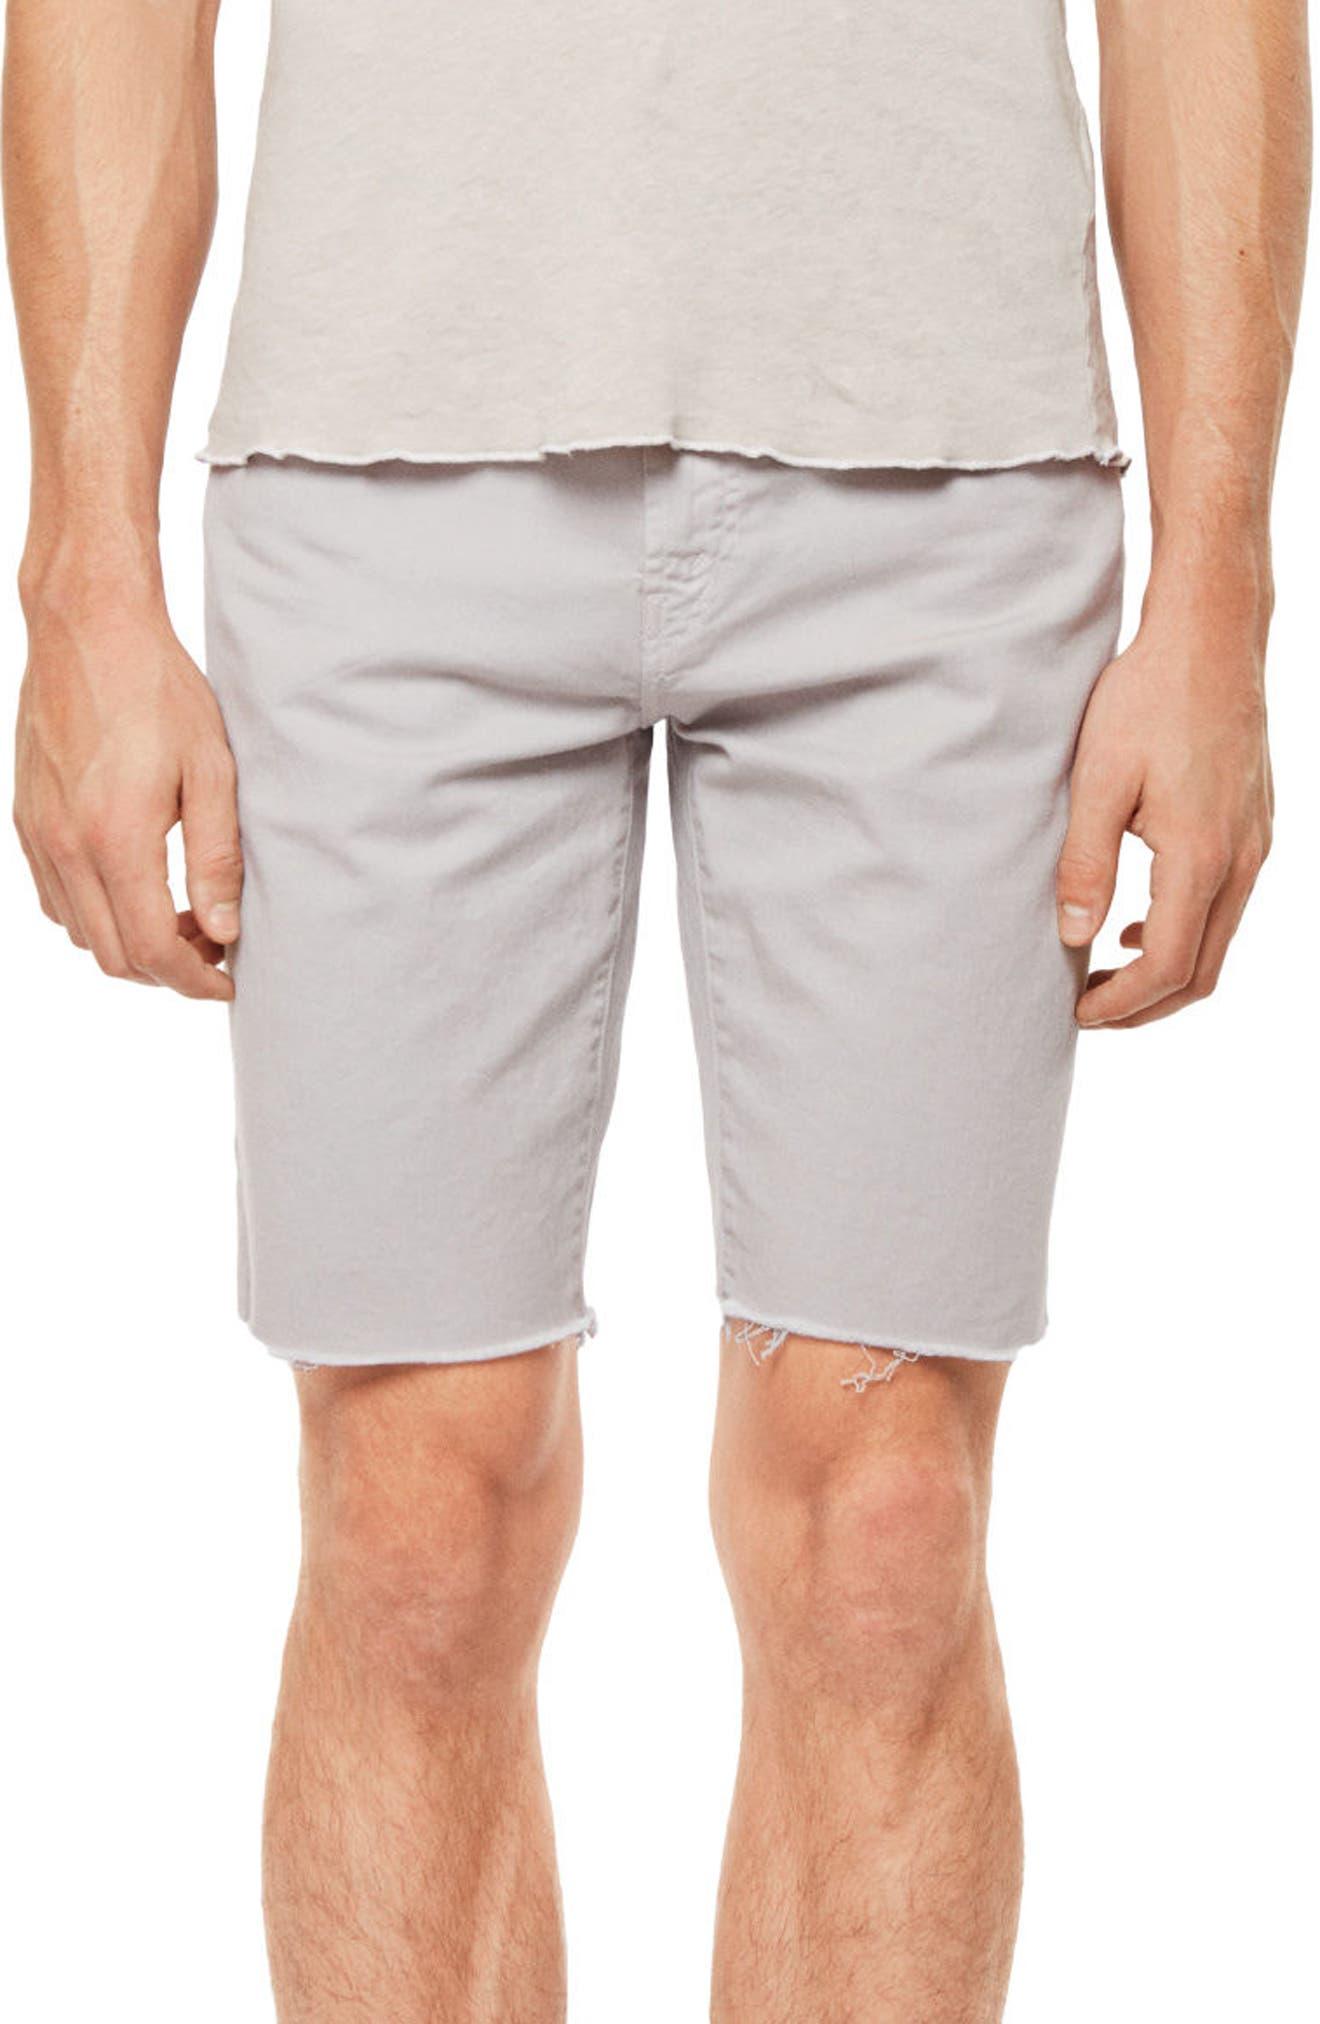 Eli Cutoff Denim Shorts,                         Main,                         color, 100